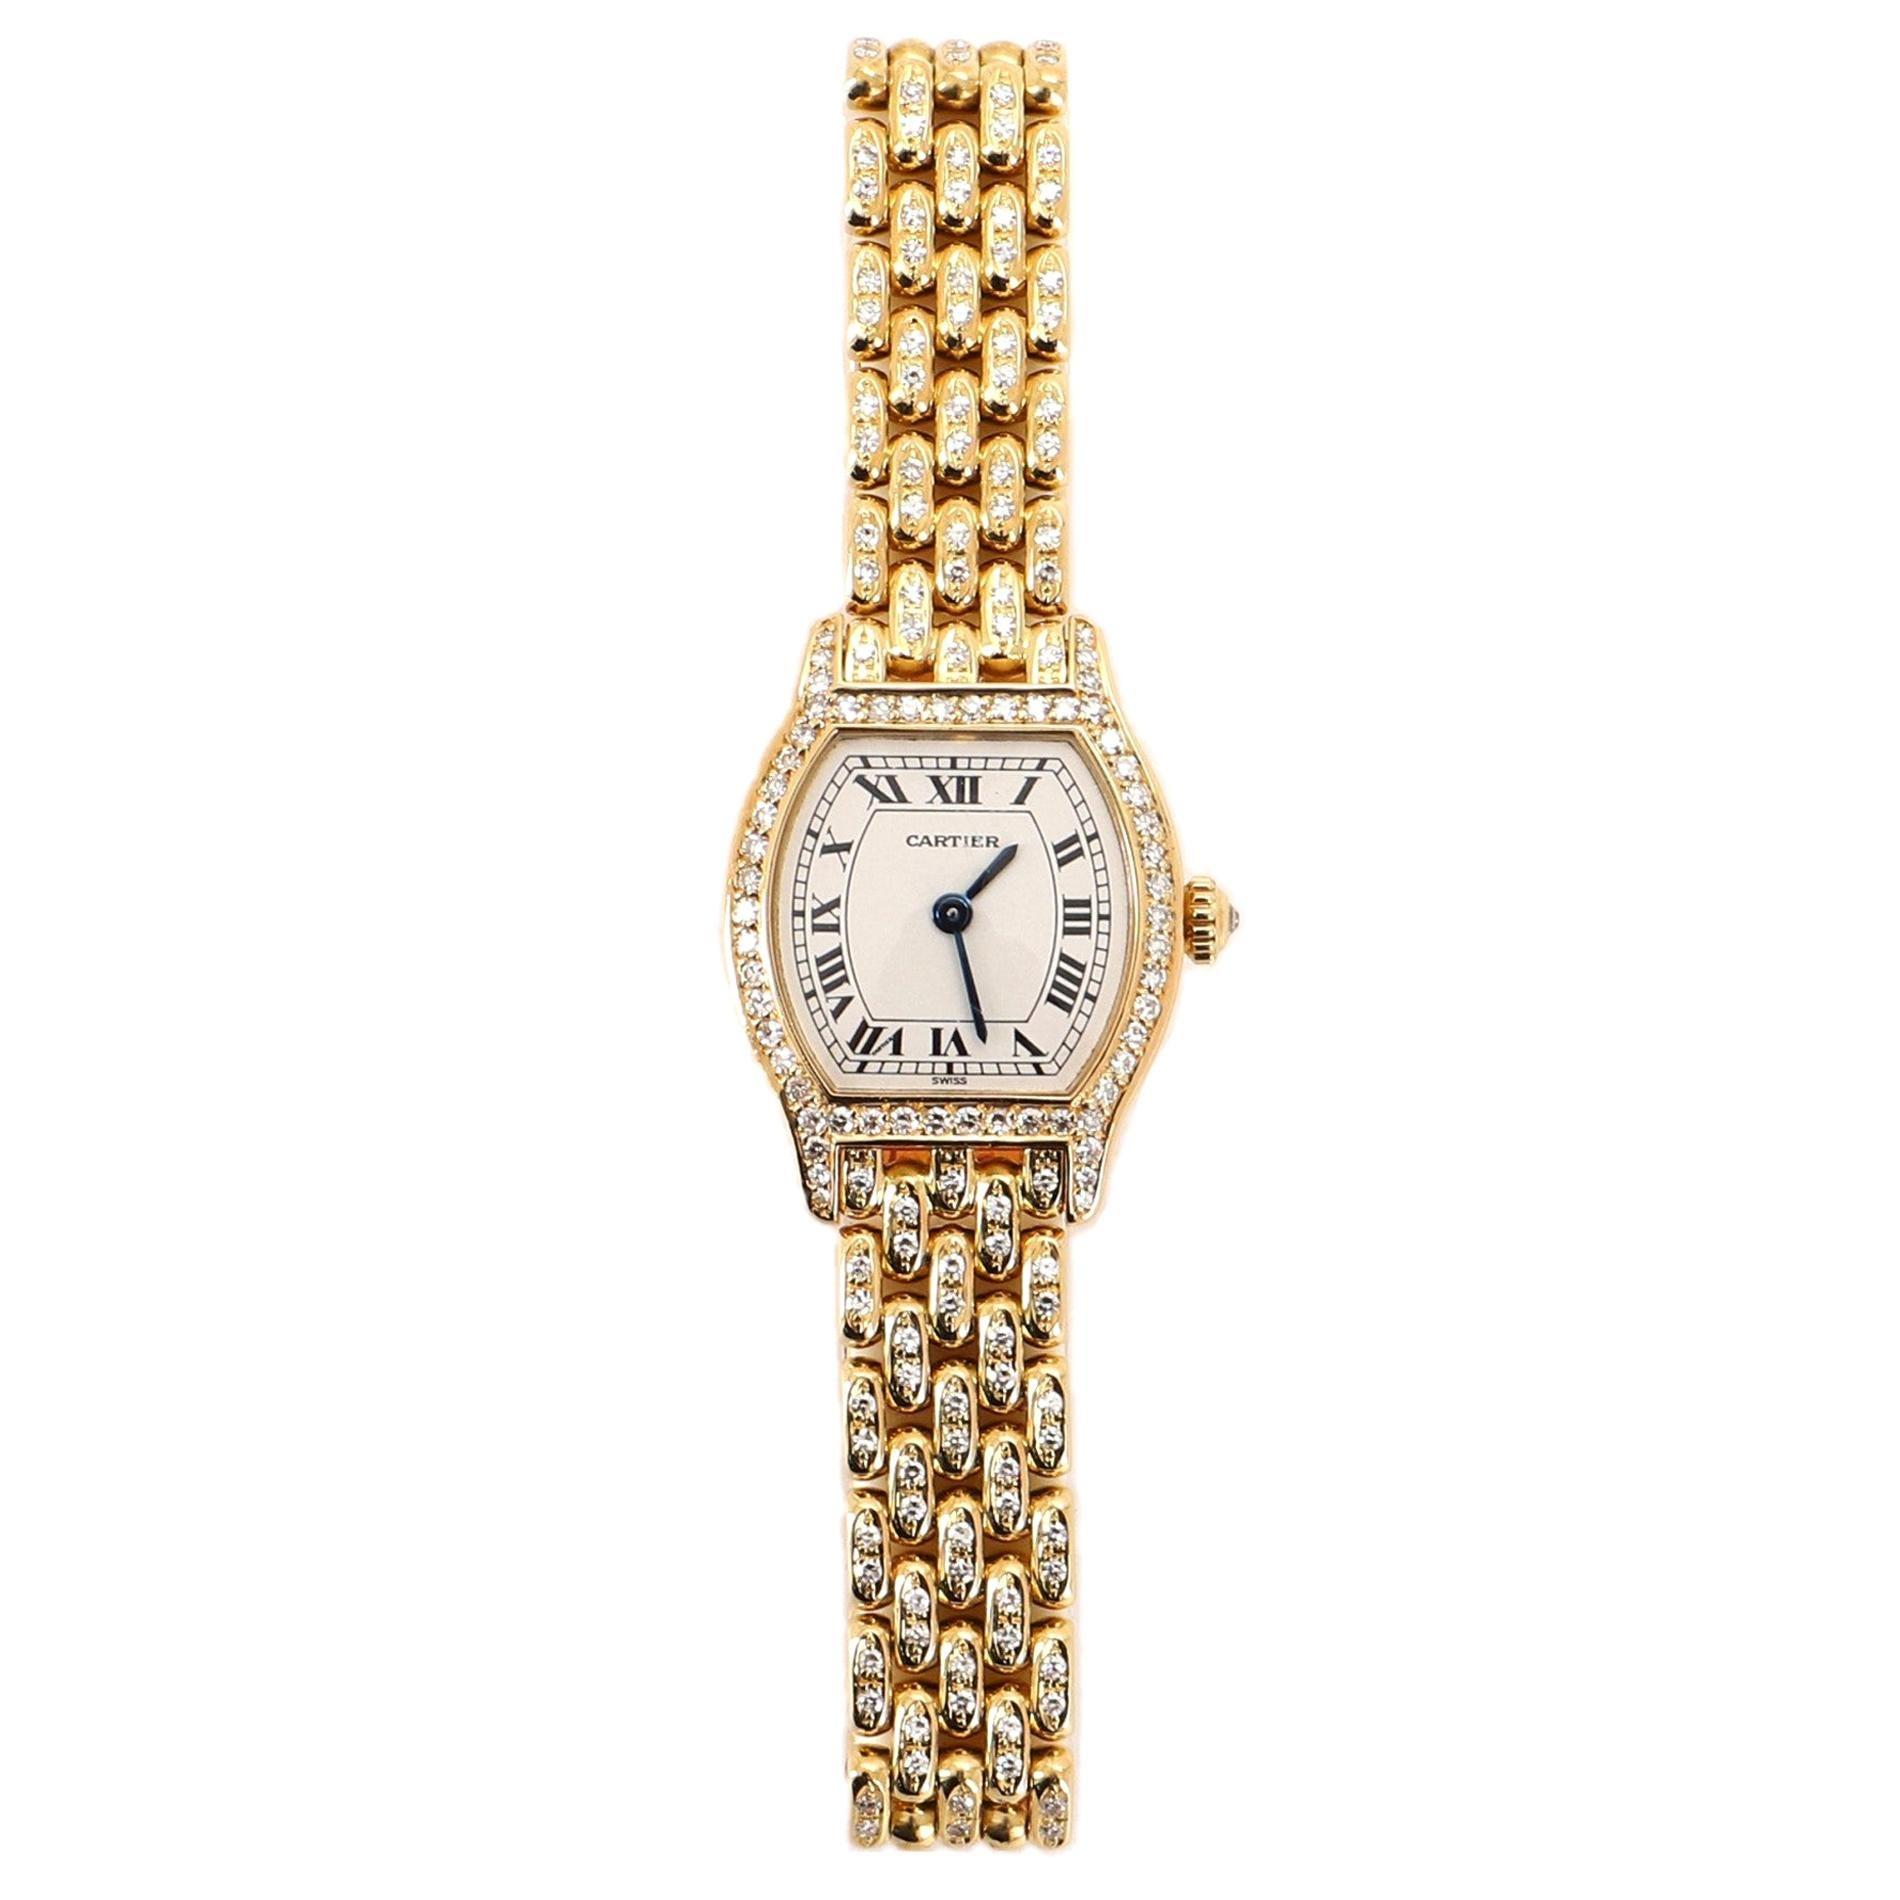 Cartier Tortue Quartz Watch Watch Yellow Gold and Diamonds 20